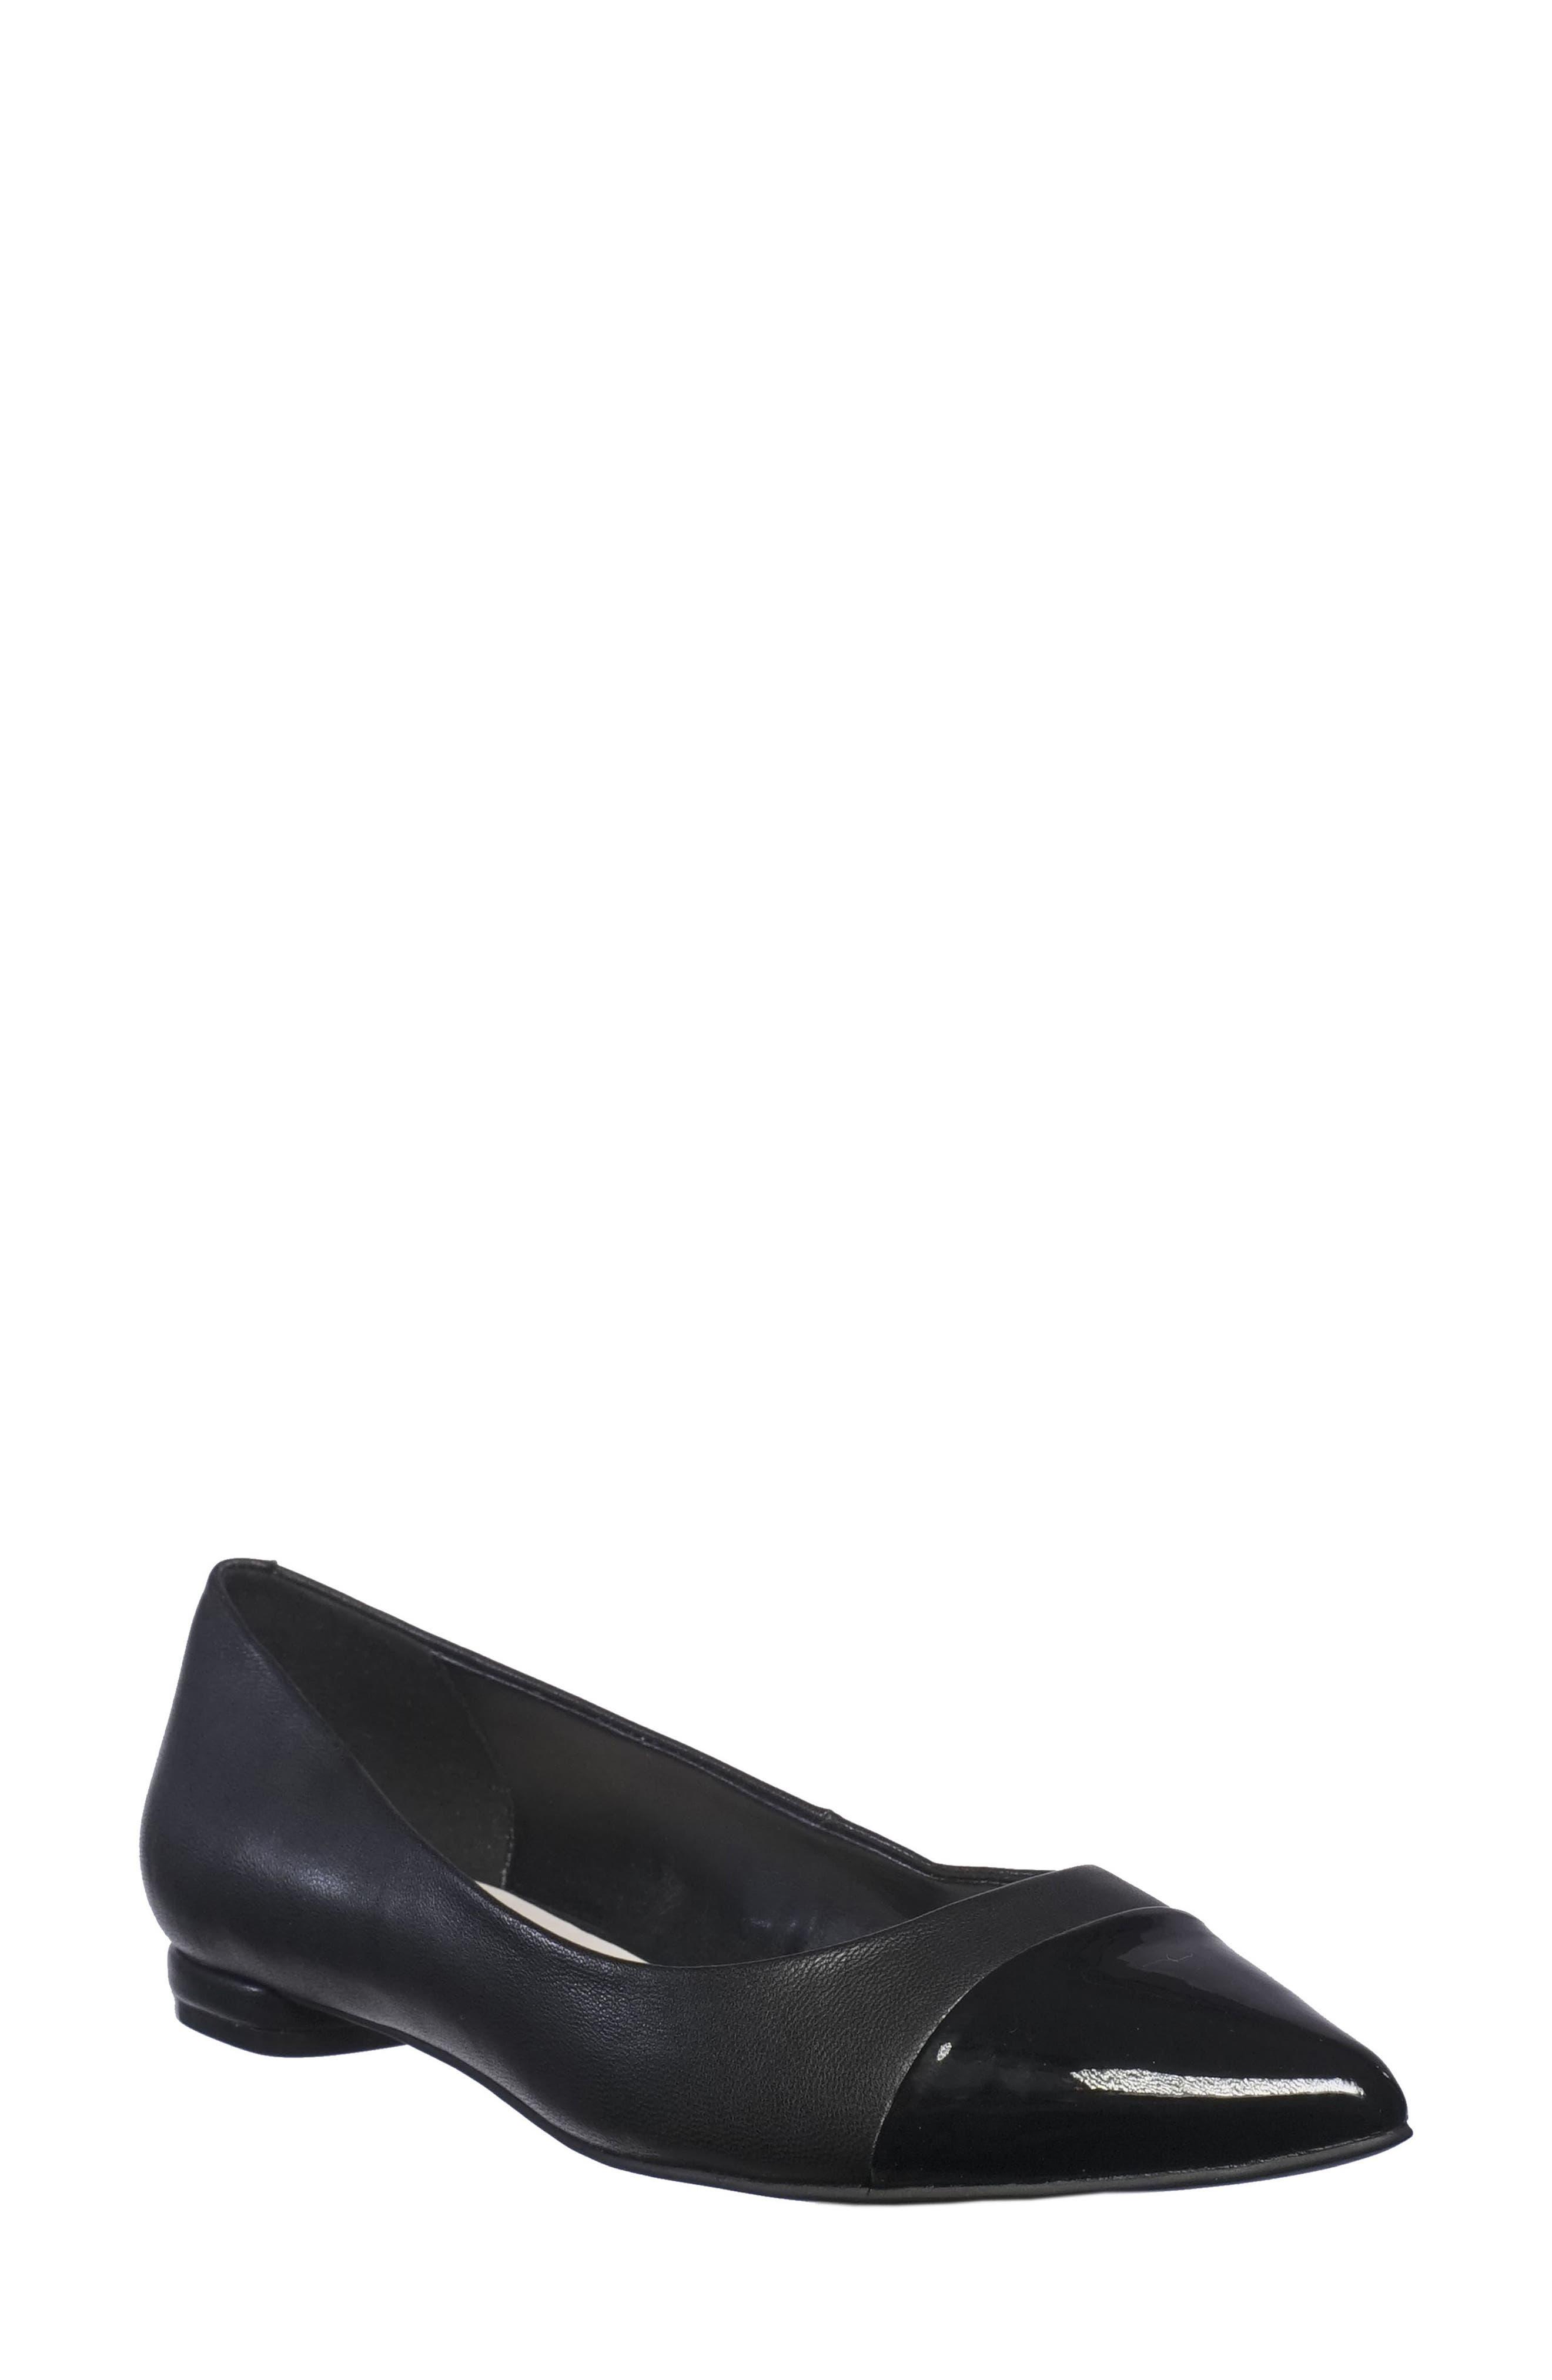 Tahari Okalani Cap Toe Skimmer Flat- Black